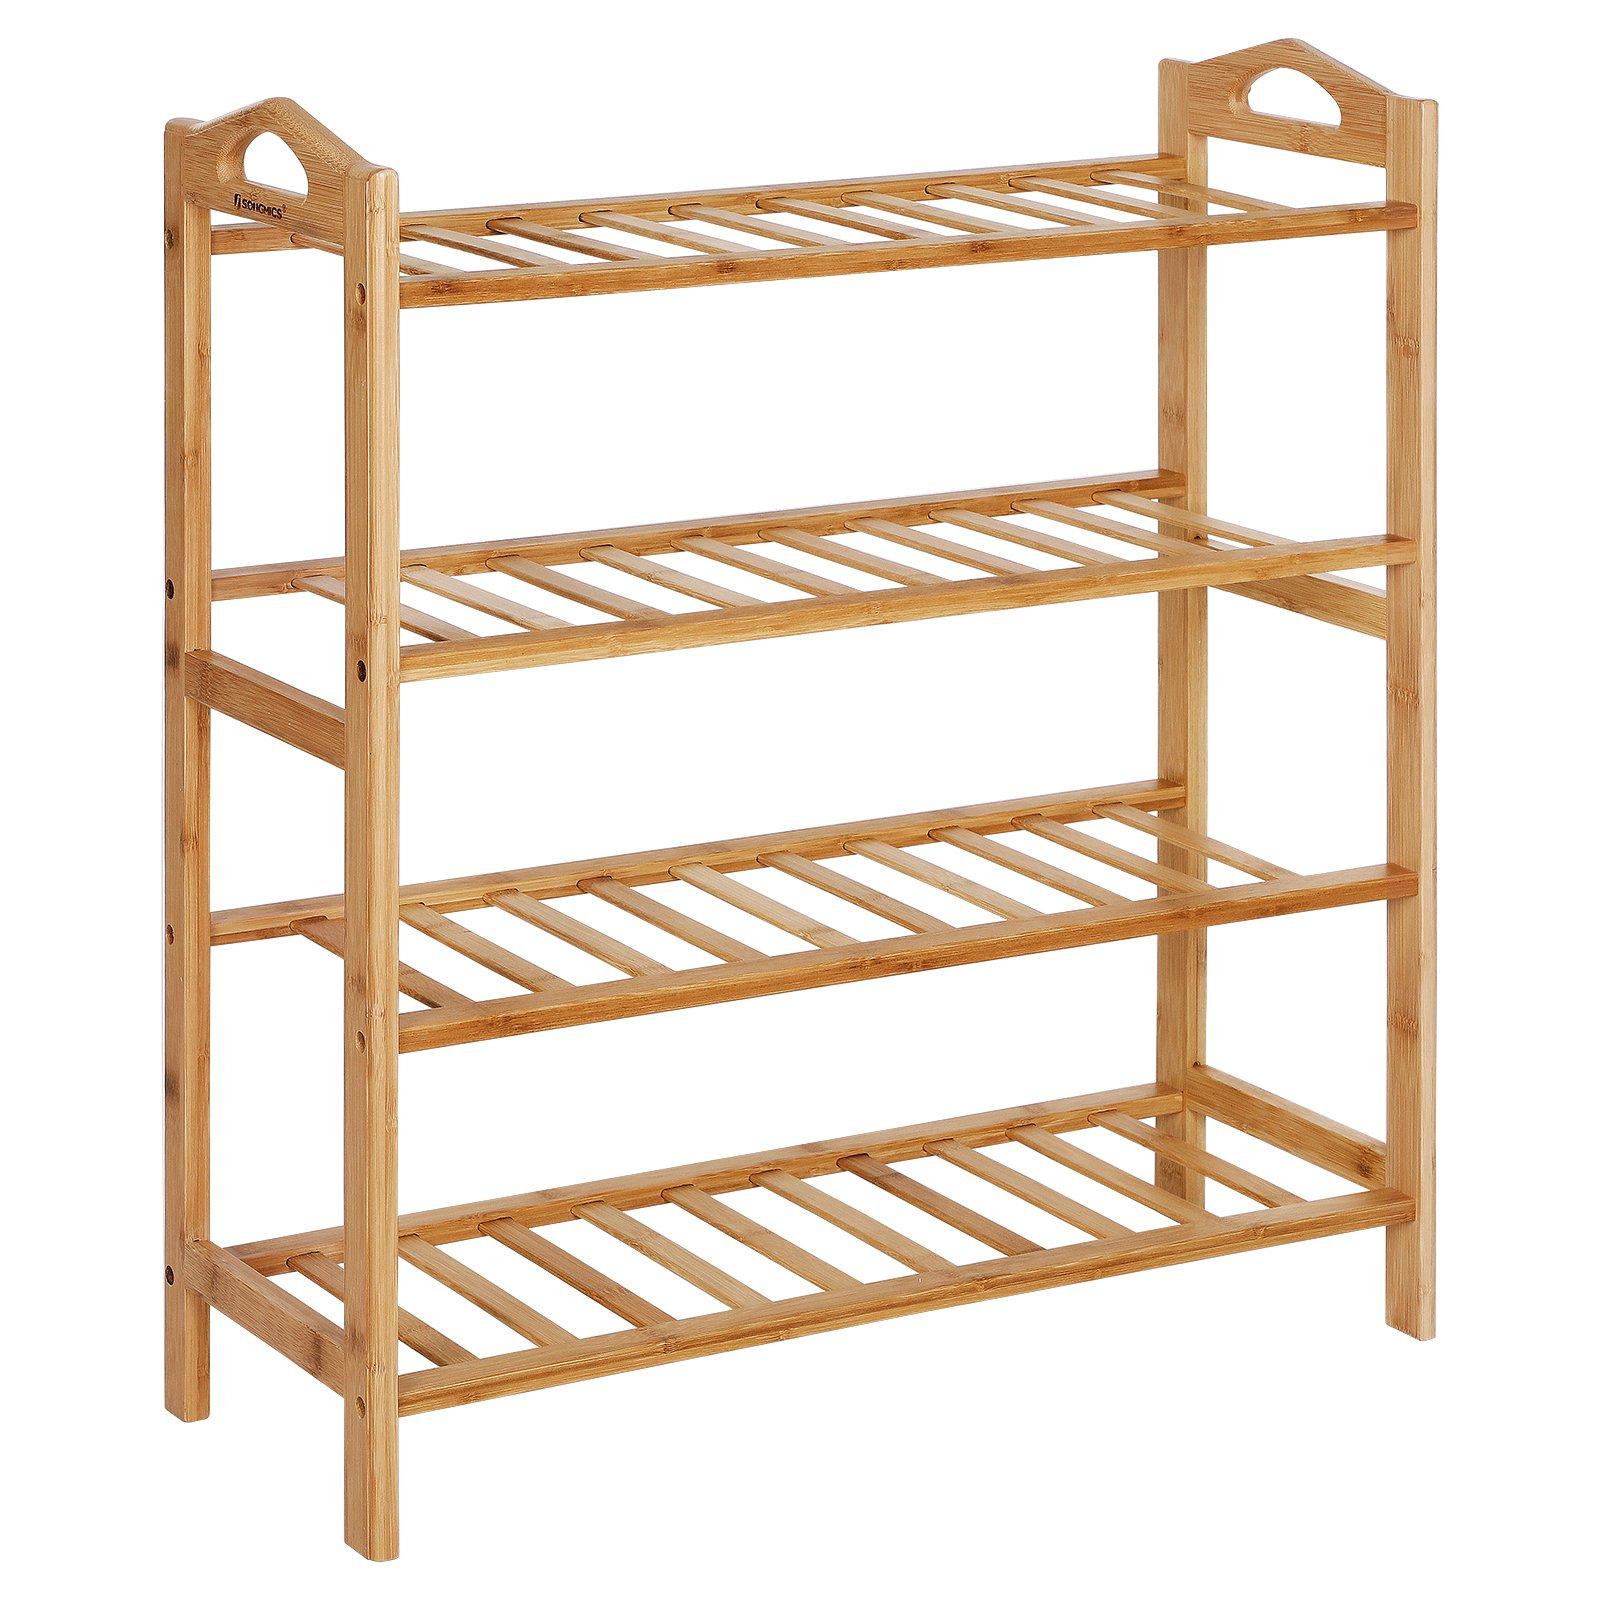 SONGMICS Bamboo Wood Shoe Rack 4-Tier 12-16 Pairs Entryway Shoe Shelf Storage Organizer ULBS94N